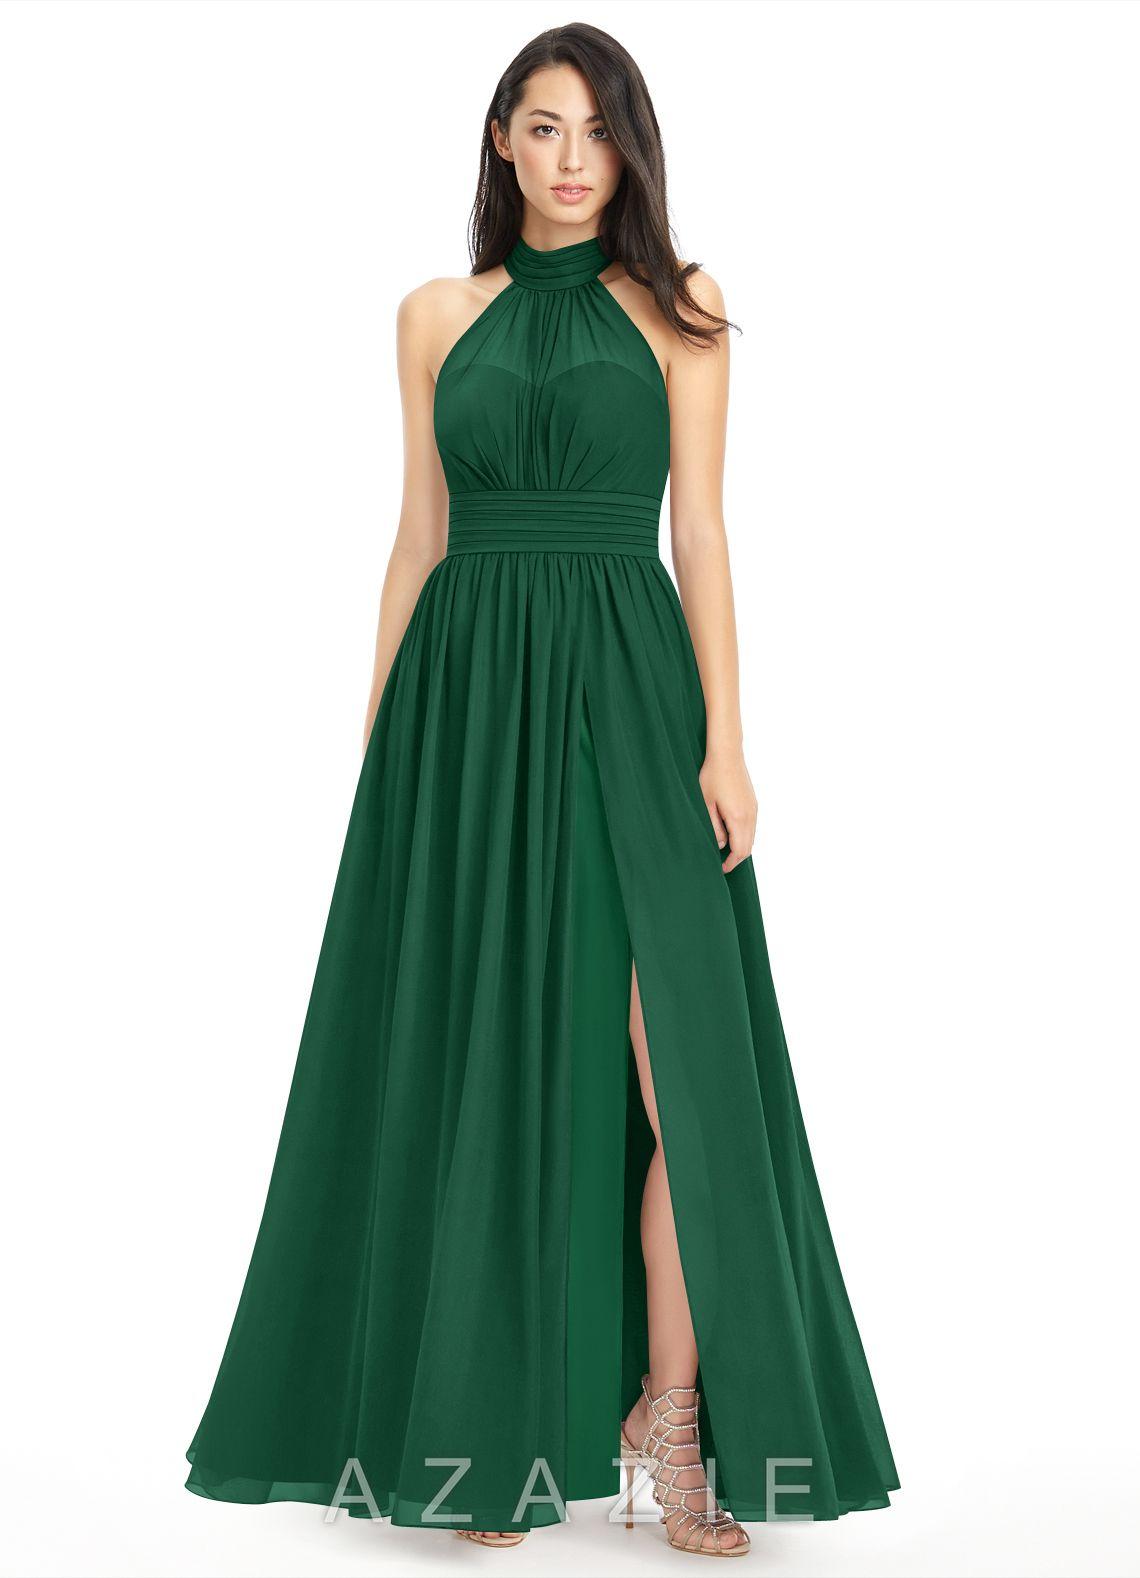 Azazie iman bridesmaid dress azazie color dark green ombrellifo Images